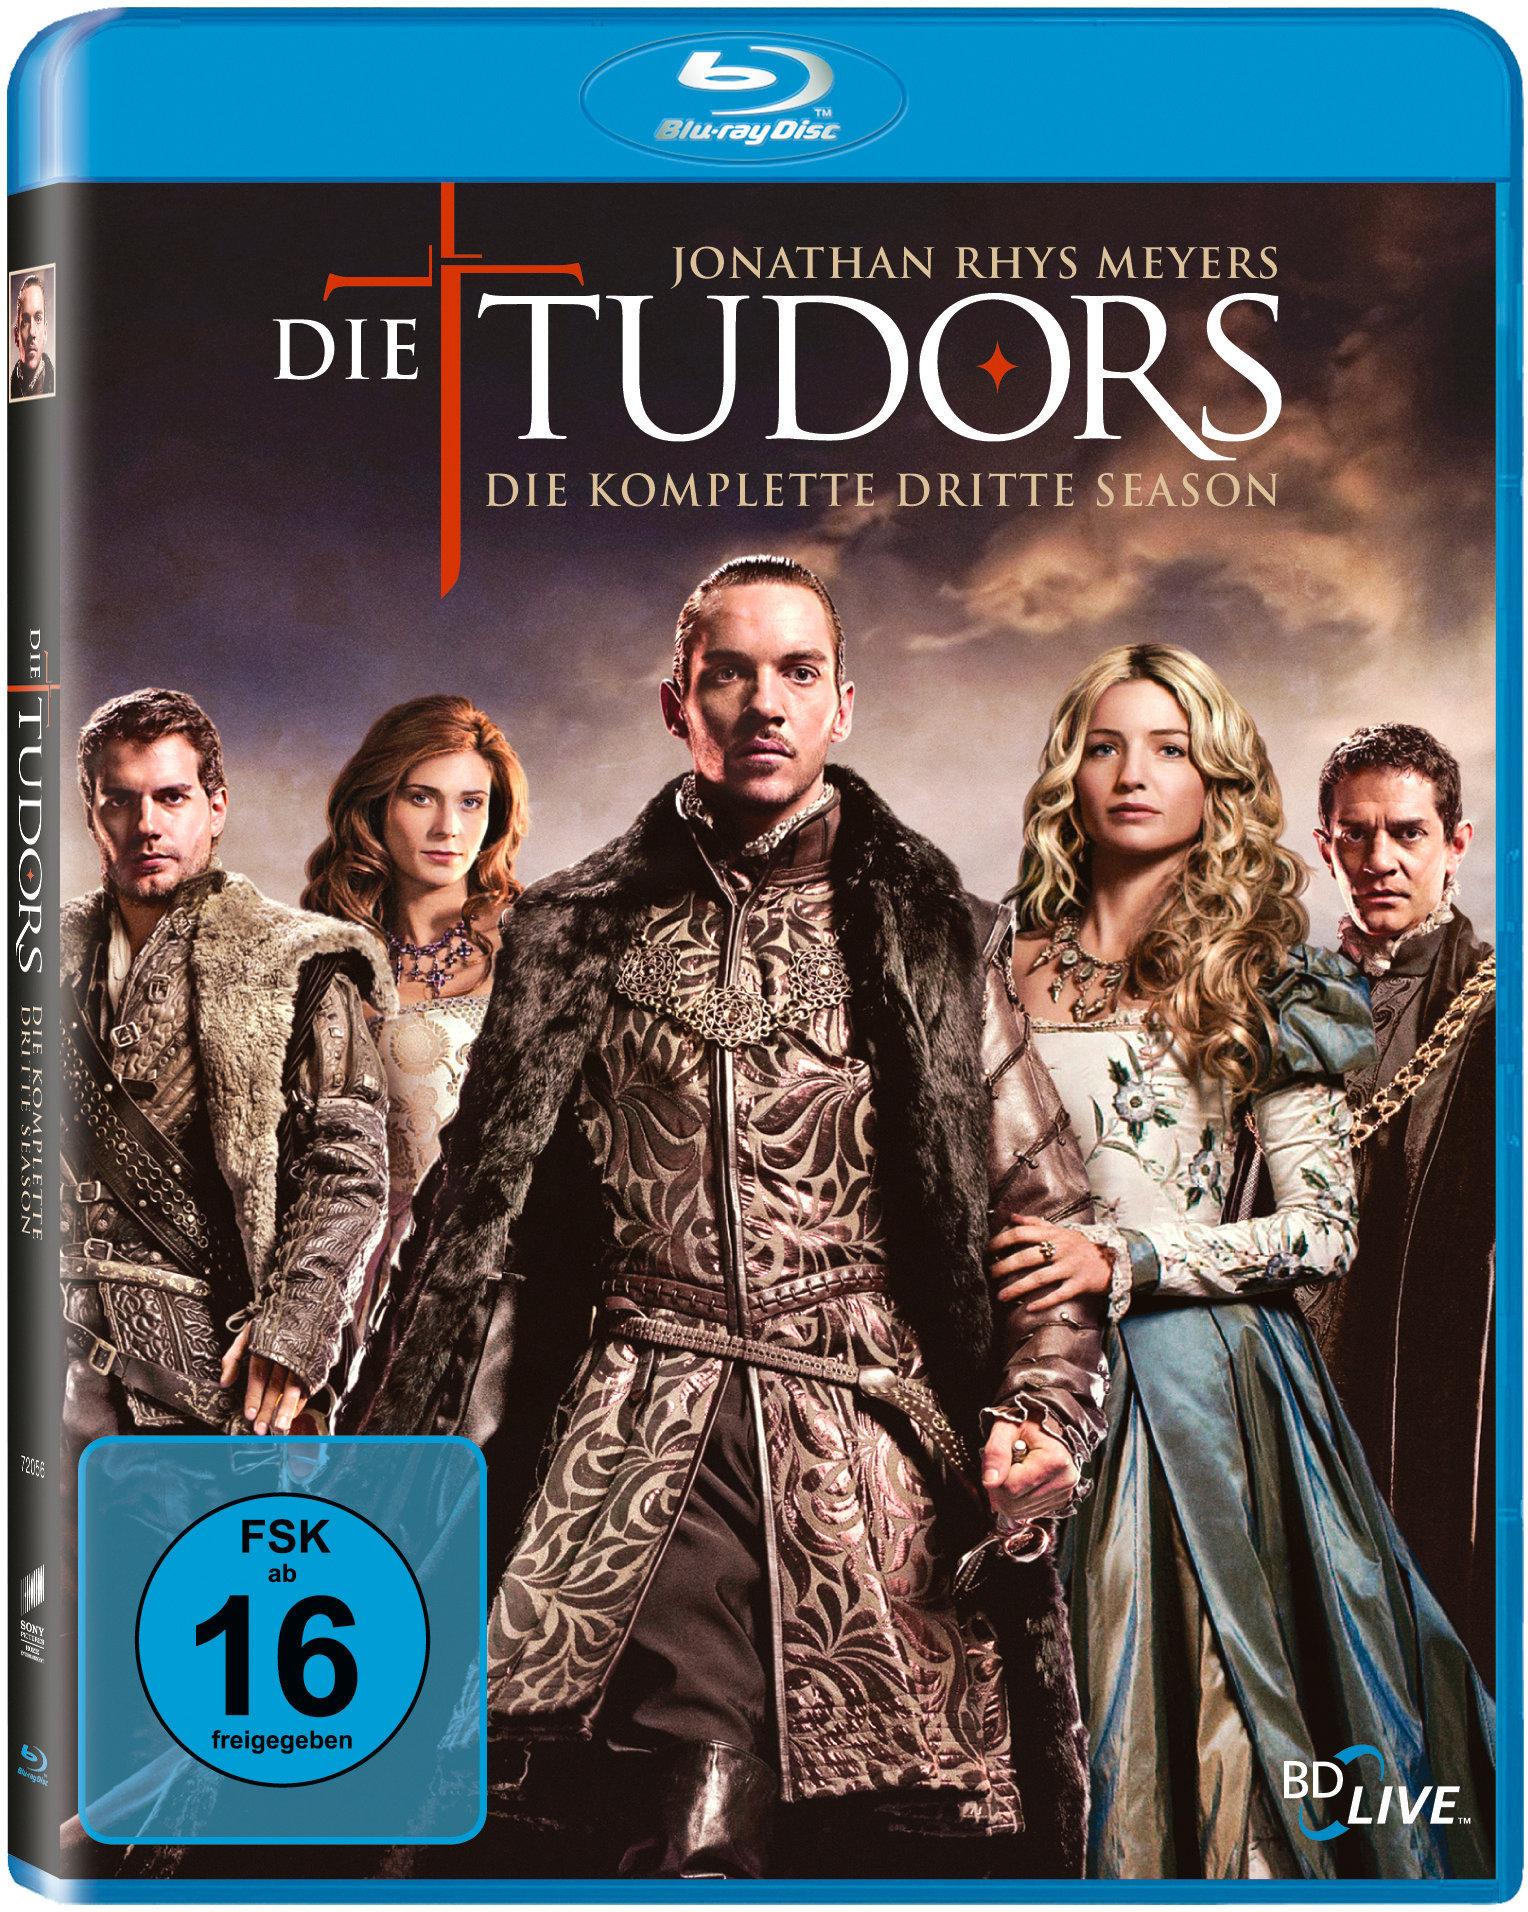 Image of Die Tudors - Season 3